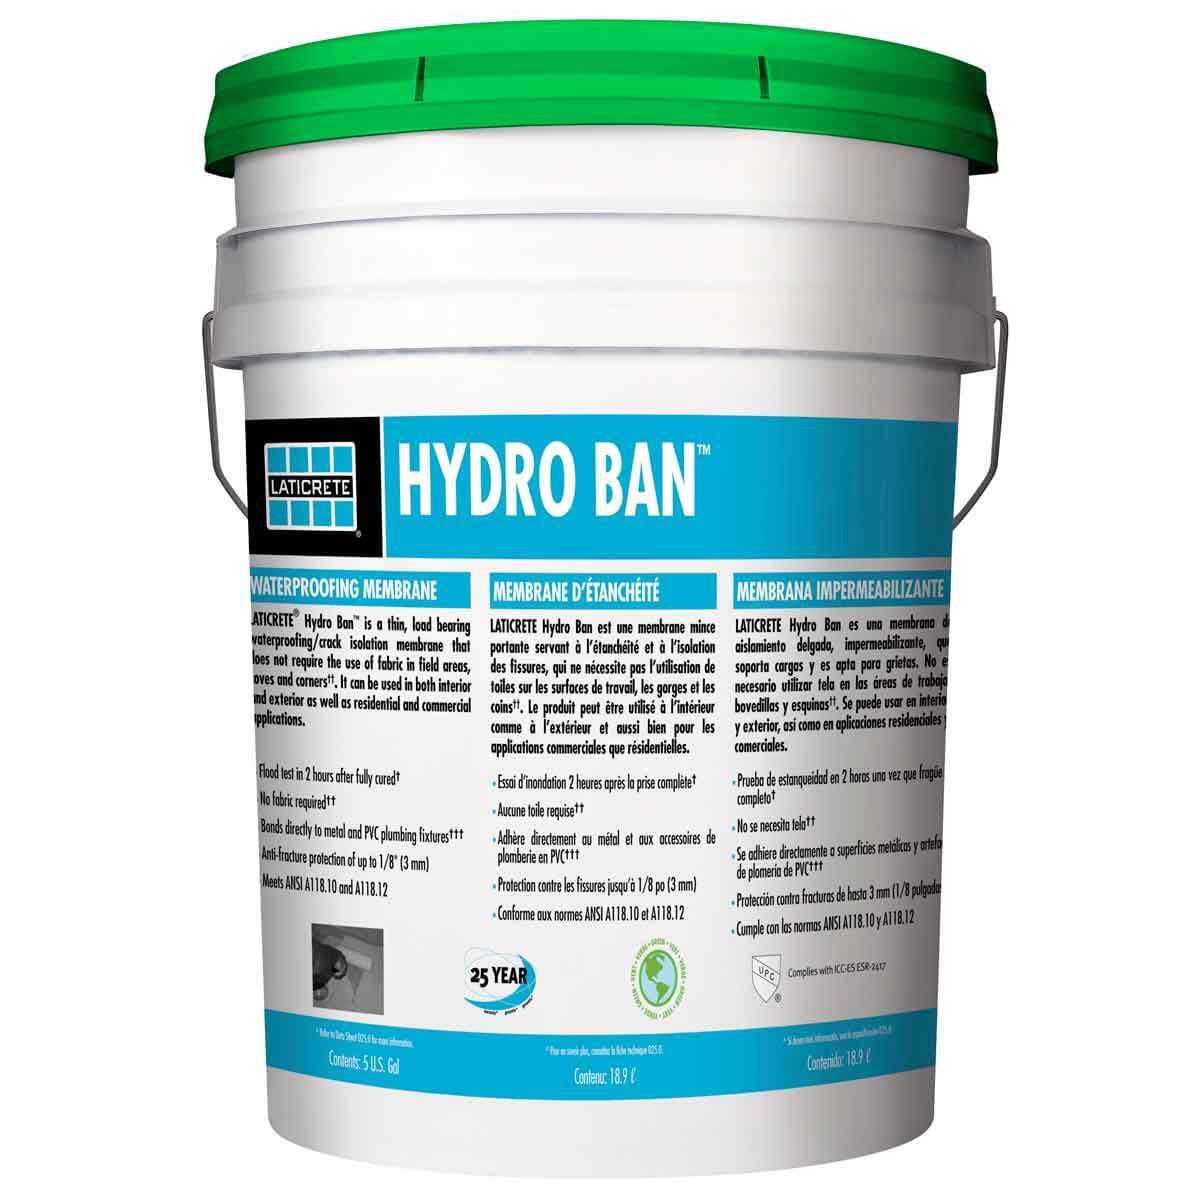 Laticrete Hydroban Waterproofing Membrane. Contractors Direct.